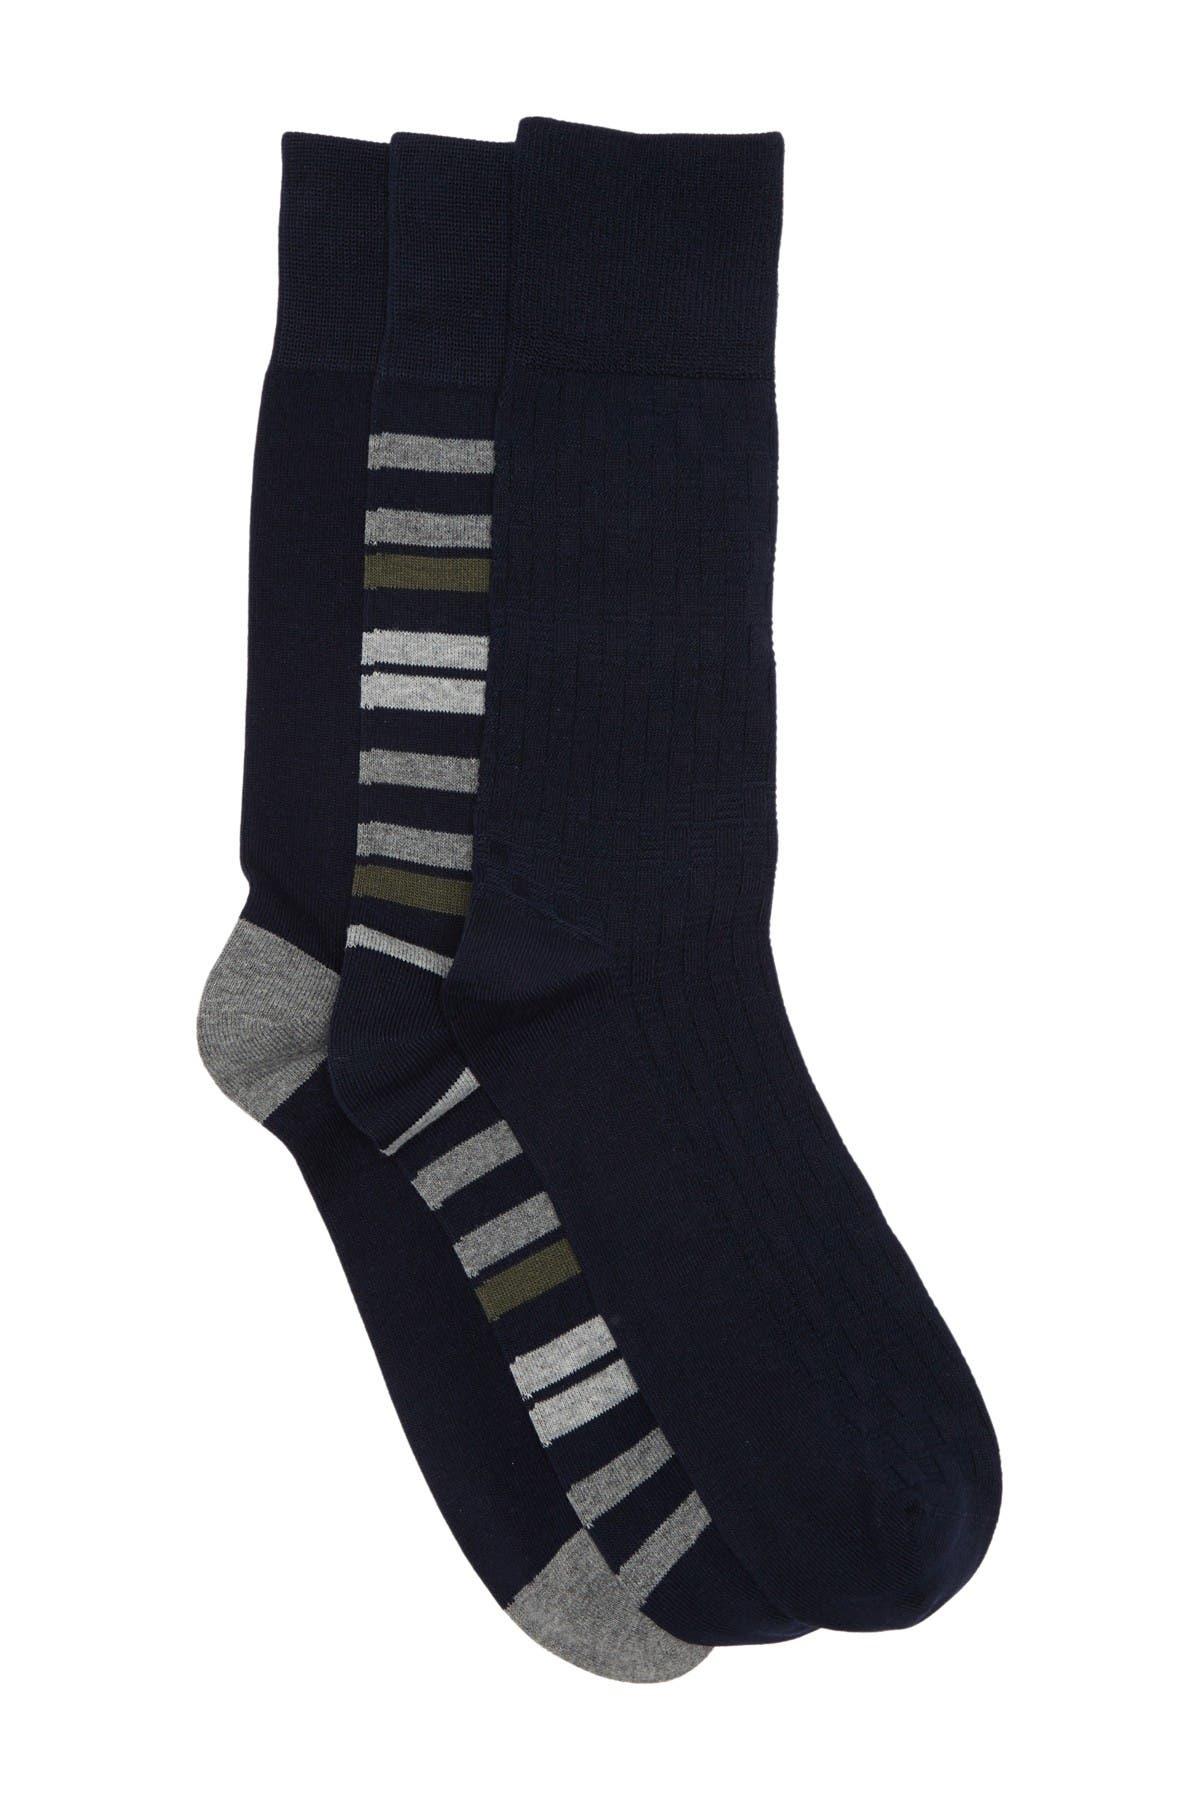 Image of Nordstrom Rack Texture Stripe Crew Socks - Pack of 3